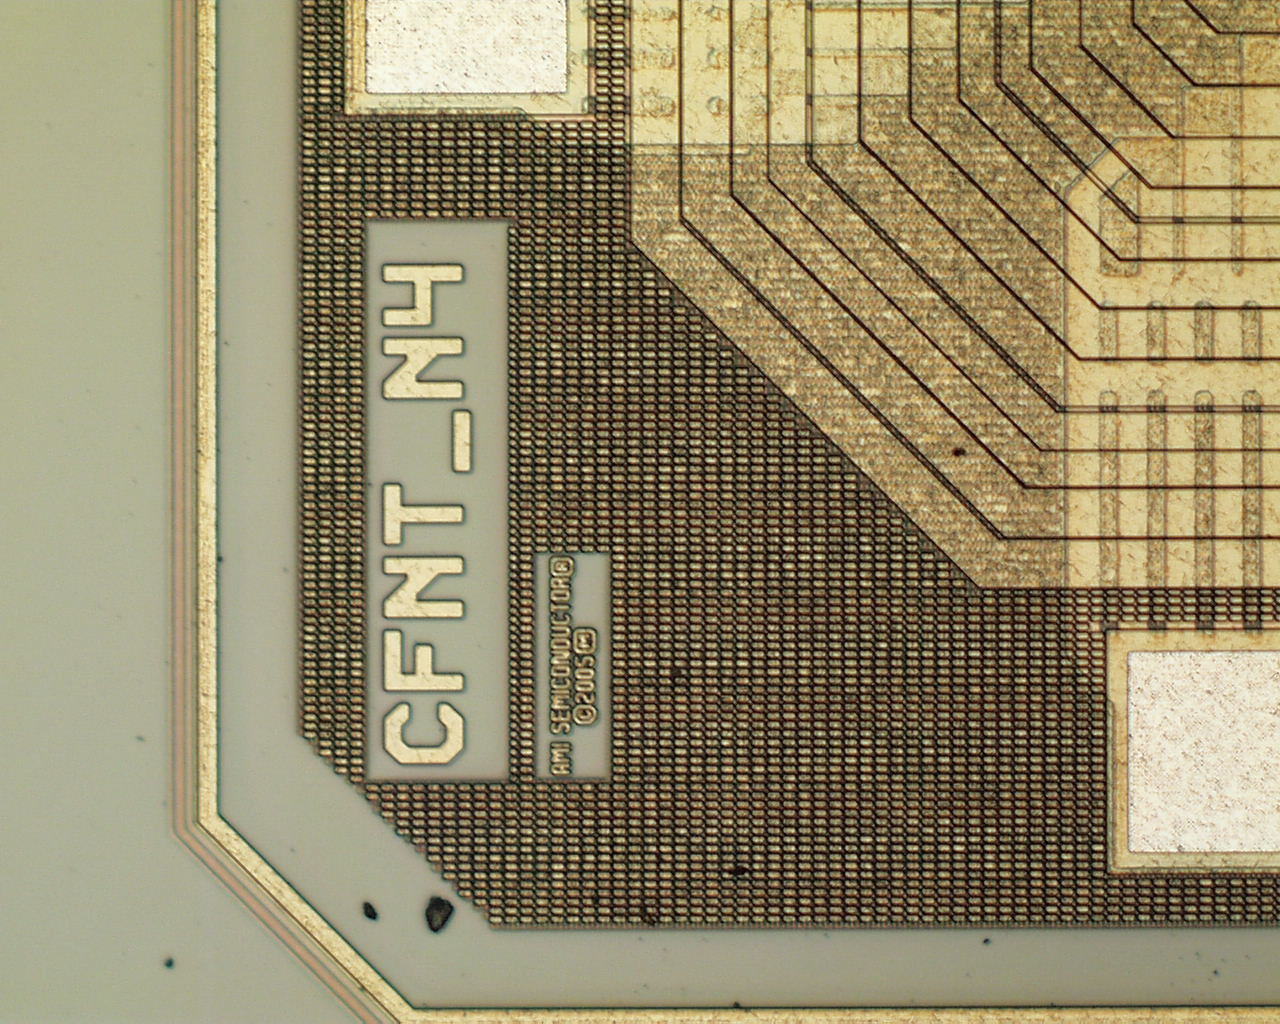 Testujeme integrované obvody